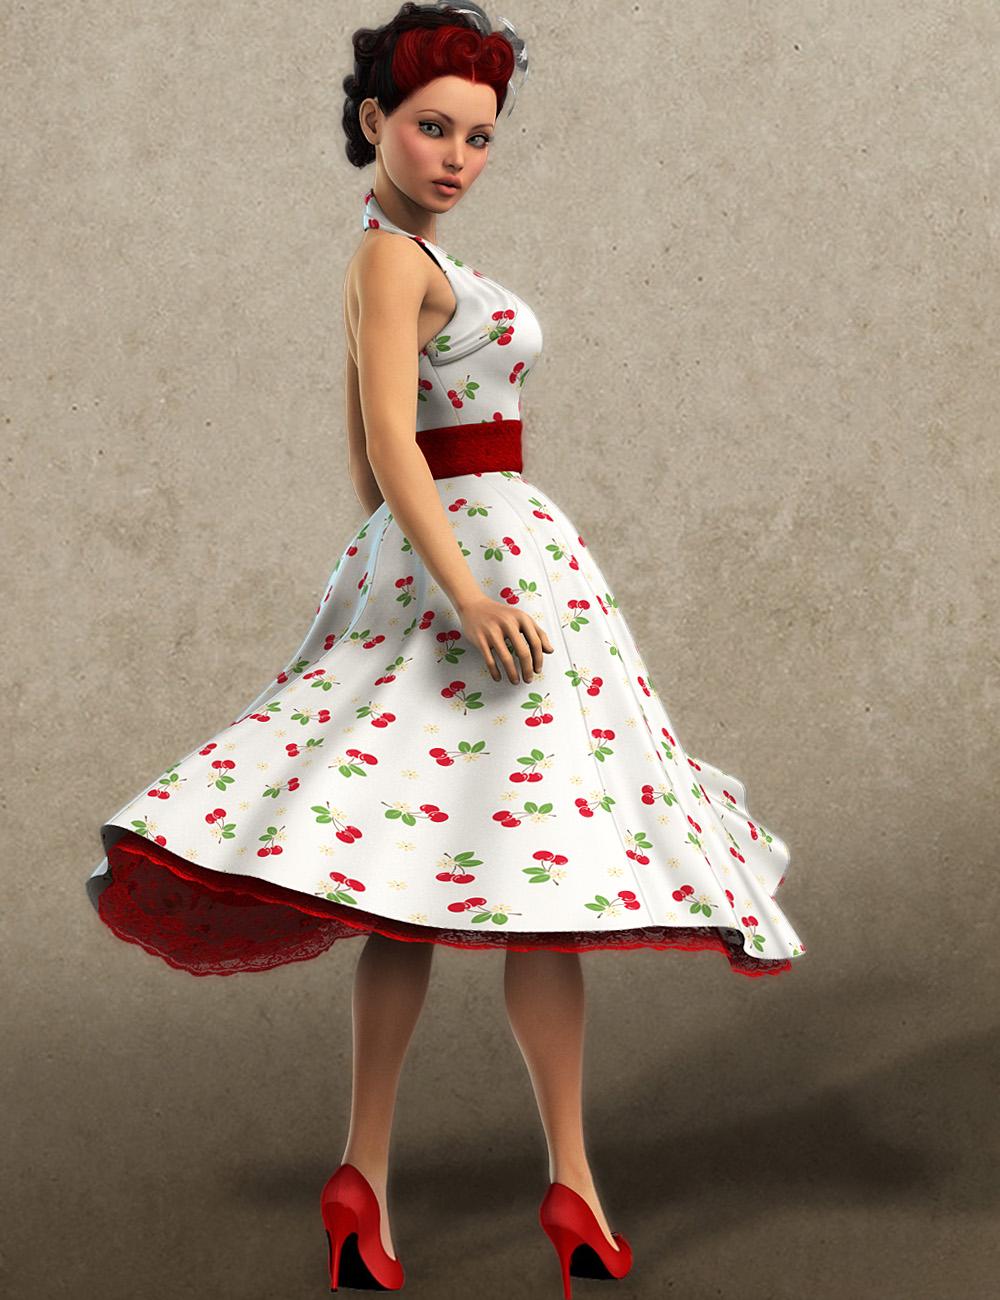 Paige Dress by: JessaiiWildDesigns, 3D Models by Daz 3D